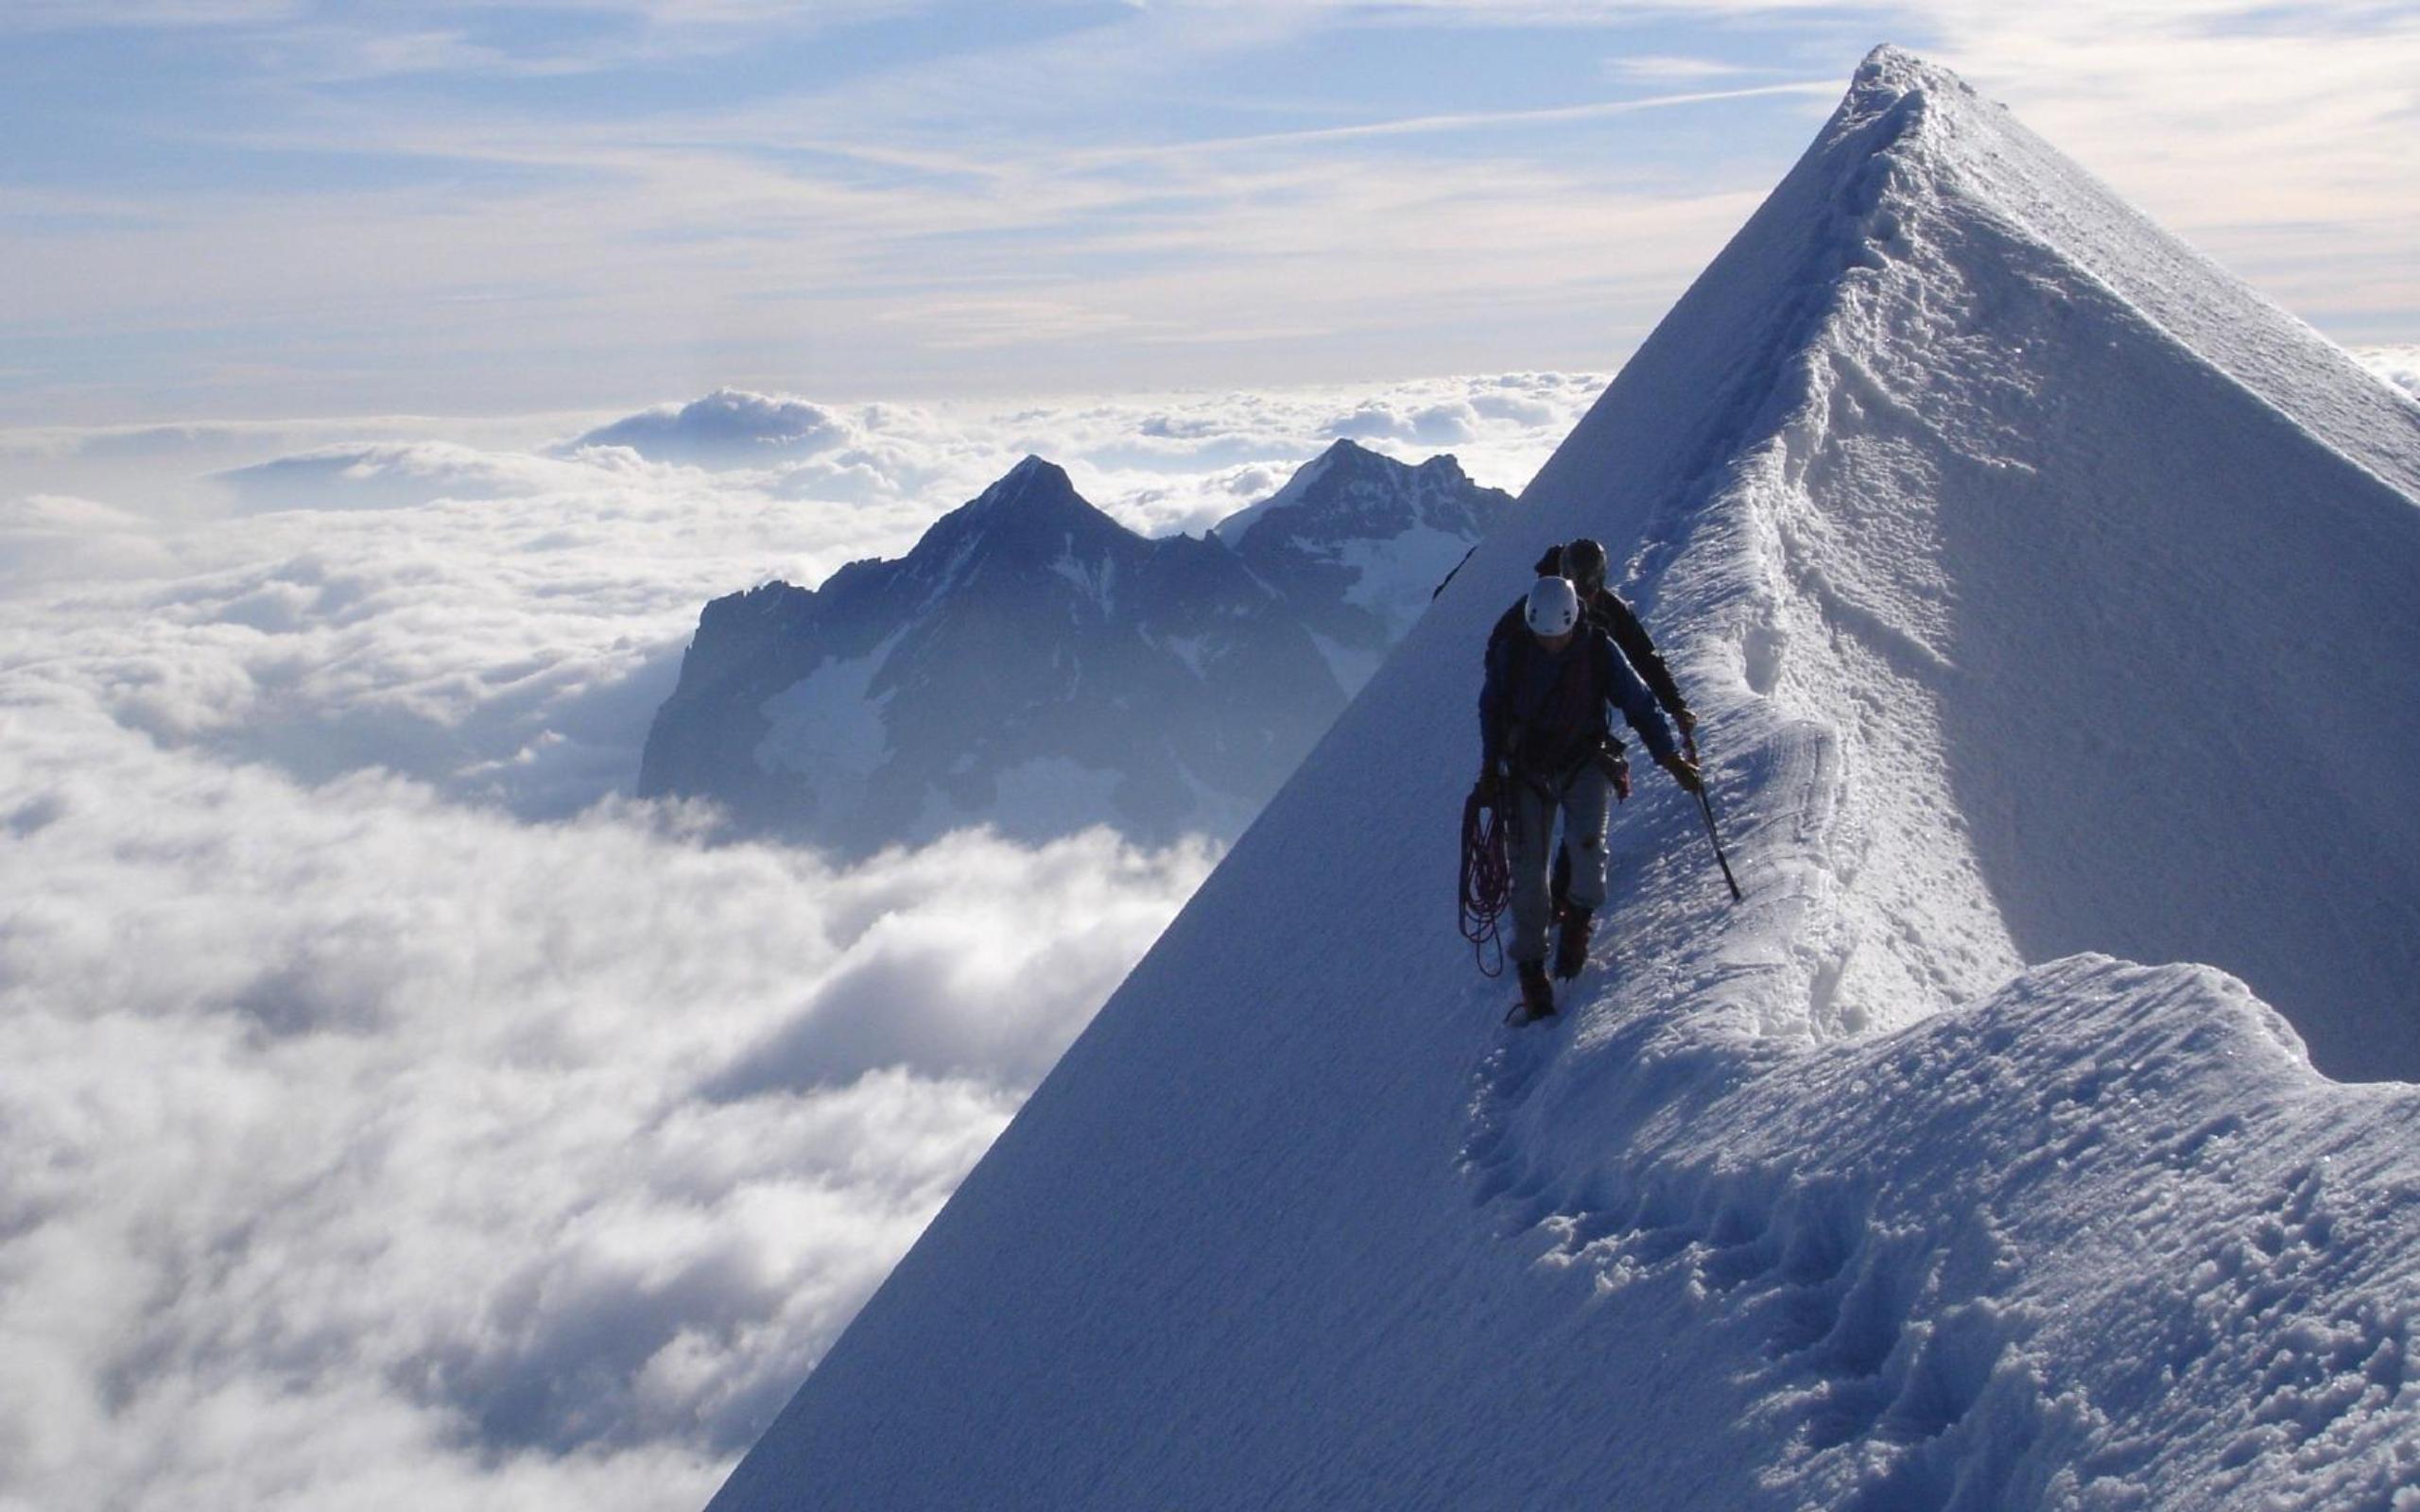 Caminando sobre glaciares - 2560x1600